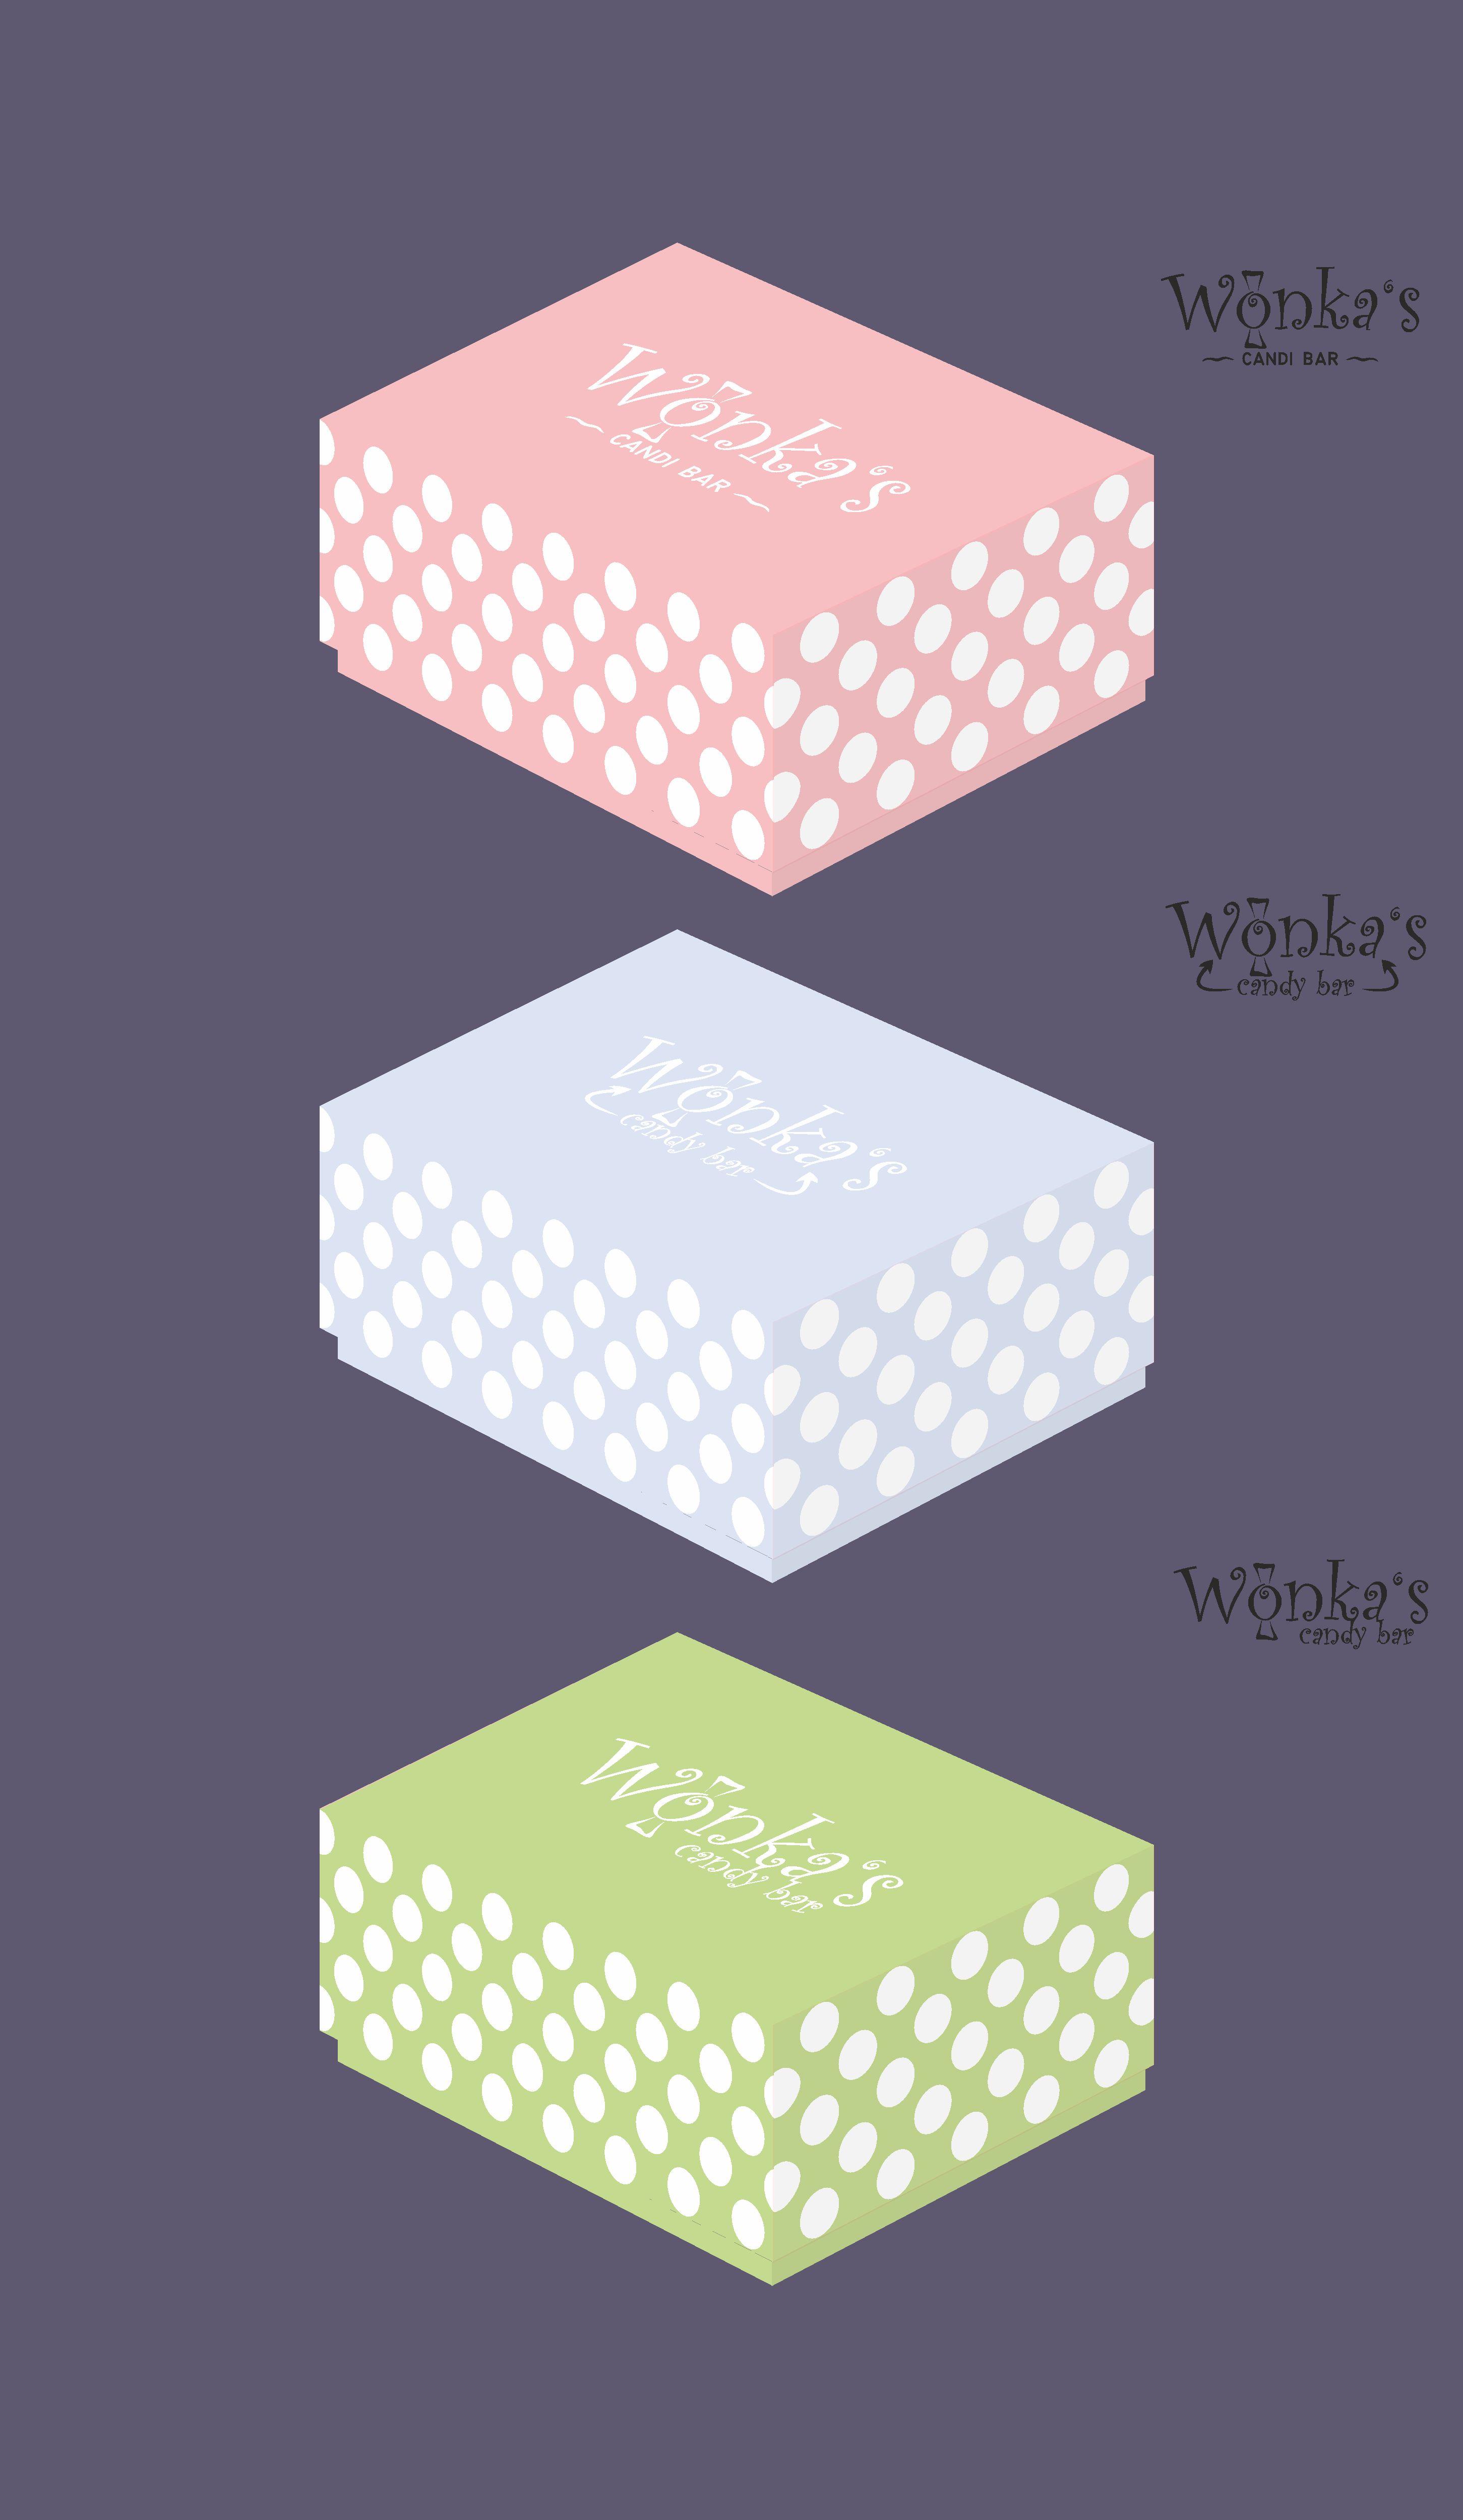 Разработка логотипа магазина сладостей со всего мира. фото f_6335a29398d5e534.jpg